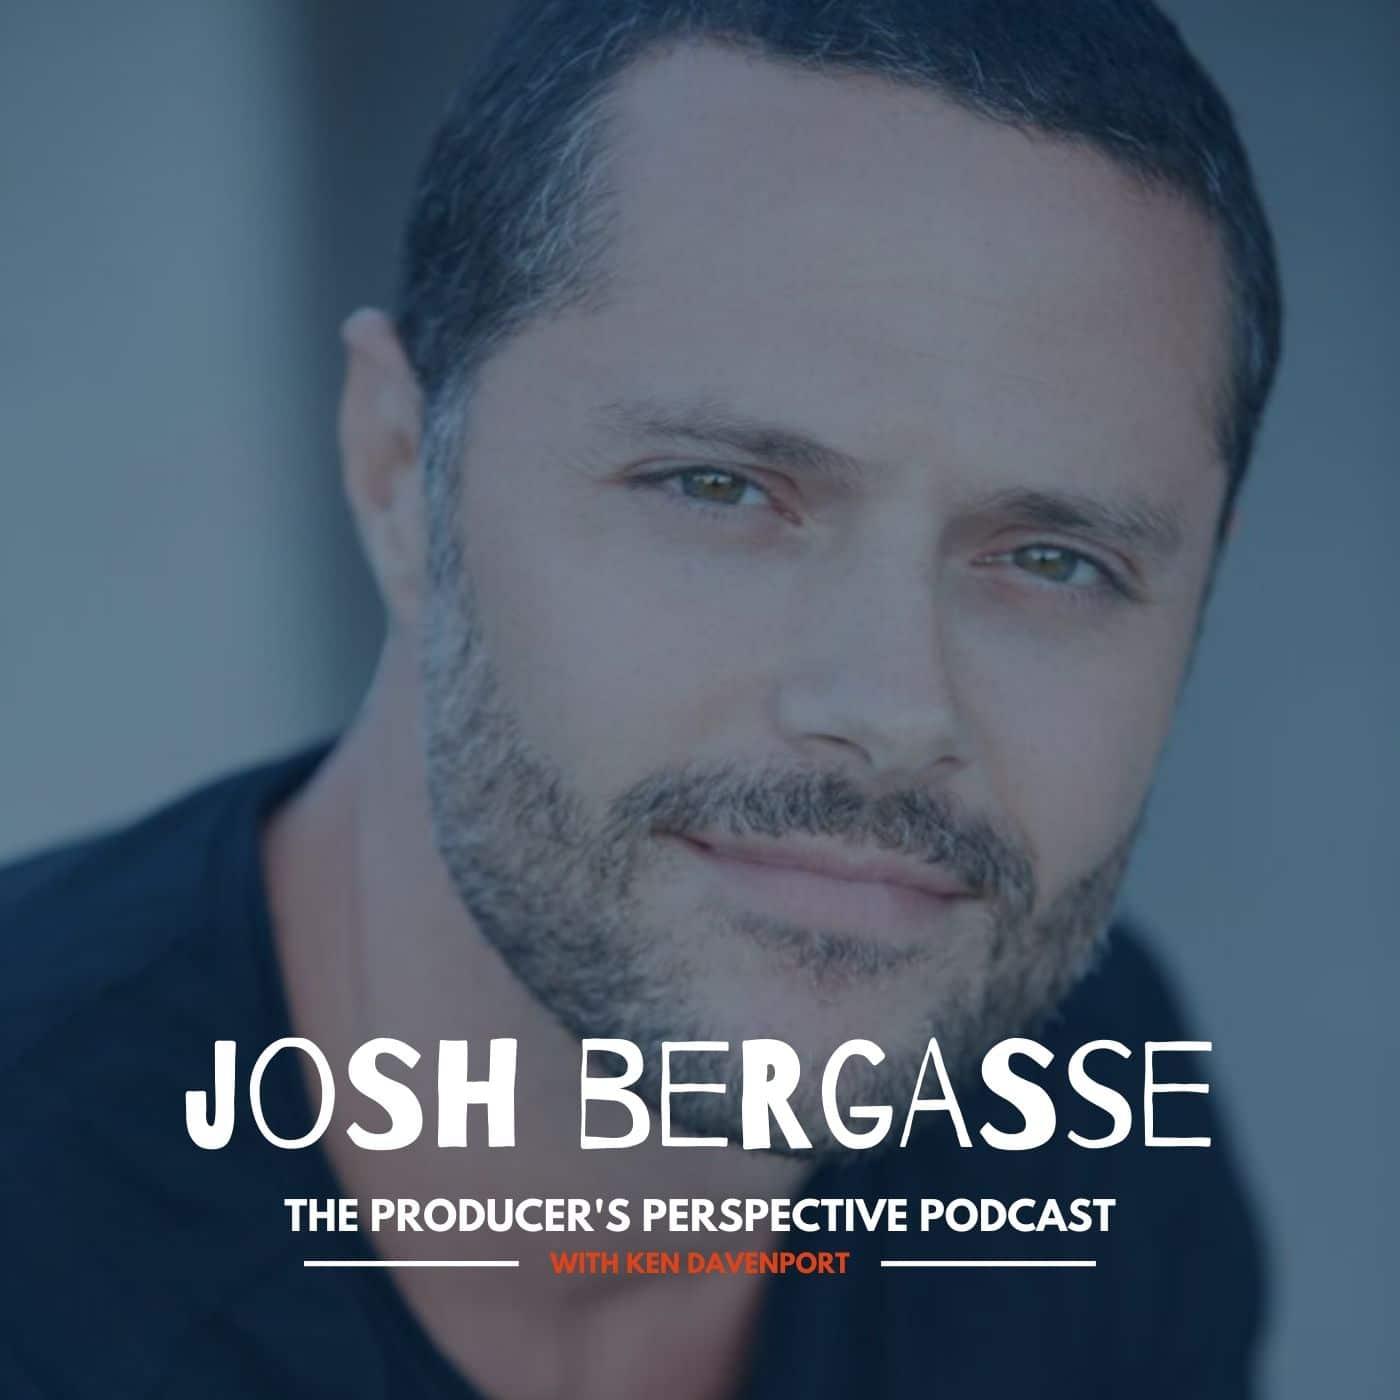 Ken Davenport's The Producer's Perspective Podcast Episode 188 - Josh Bergasse